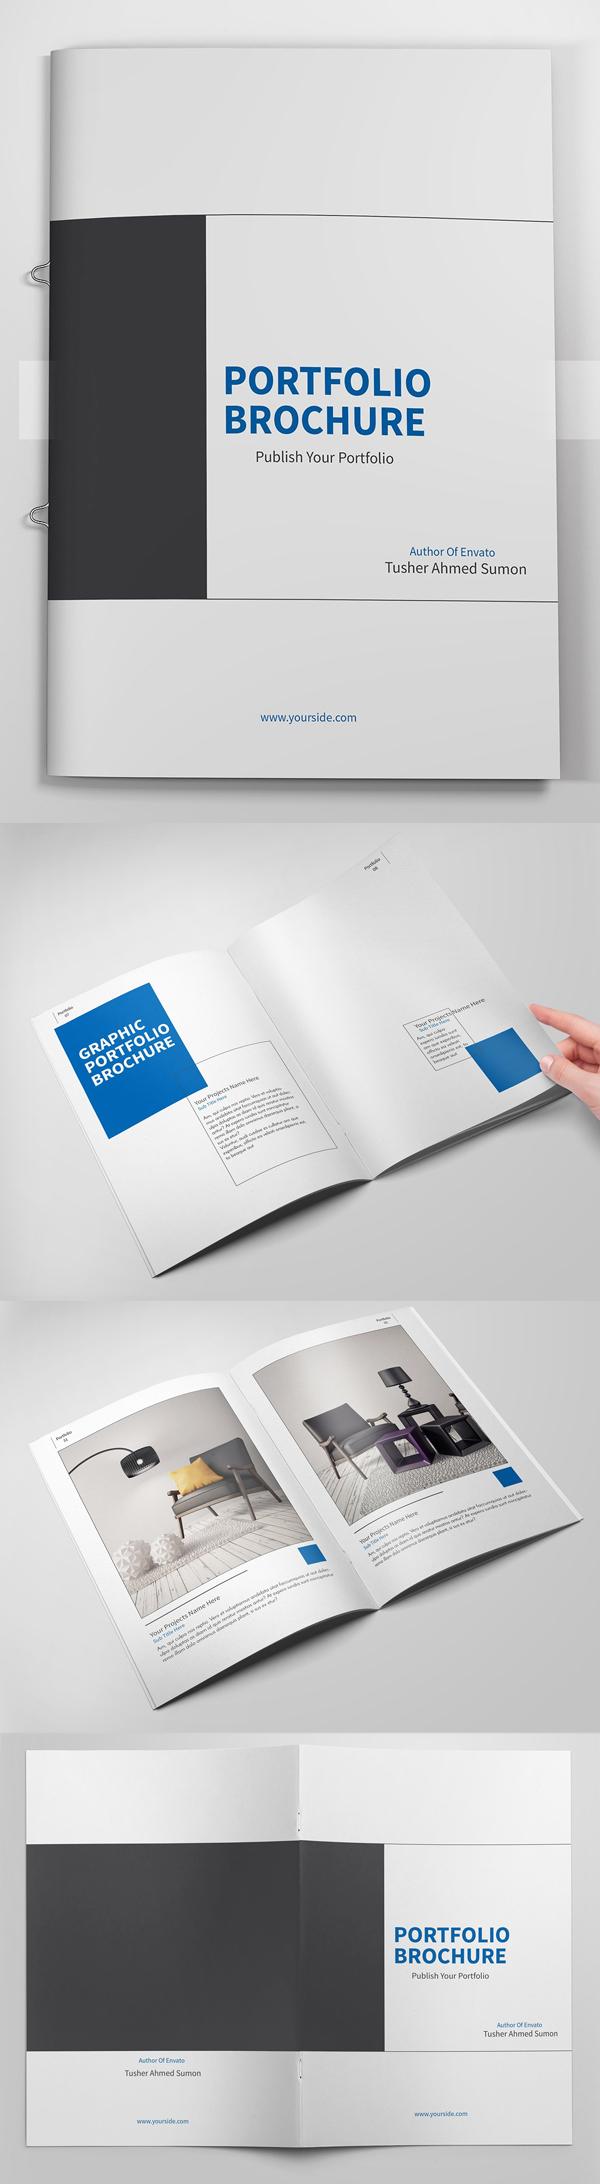 Minimal Portfolio Brochures Template Design